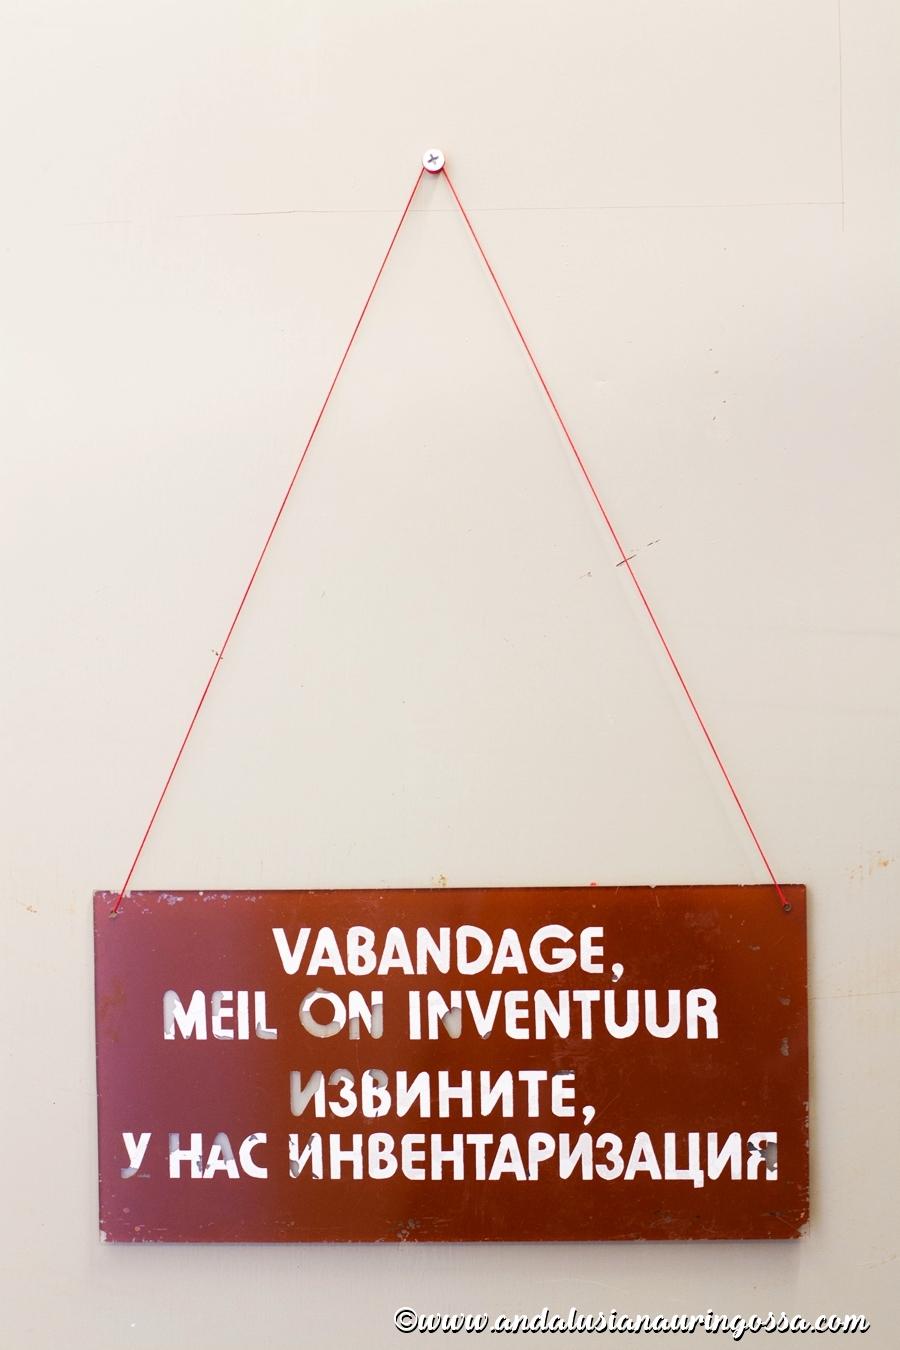 Viru-hotelli_KGB-museo_Tallinna_Andalusian auringossa_ruokablogi_matkablogi_3